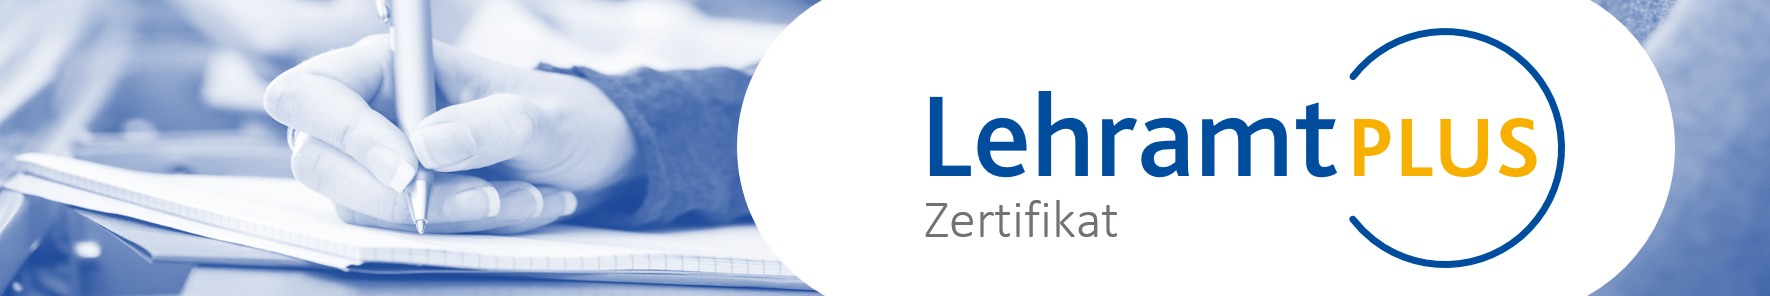 LehramtPLUS Logo